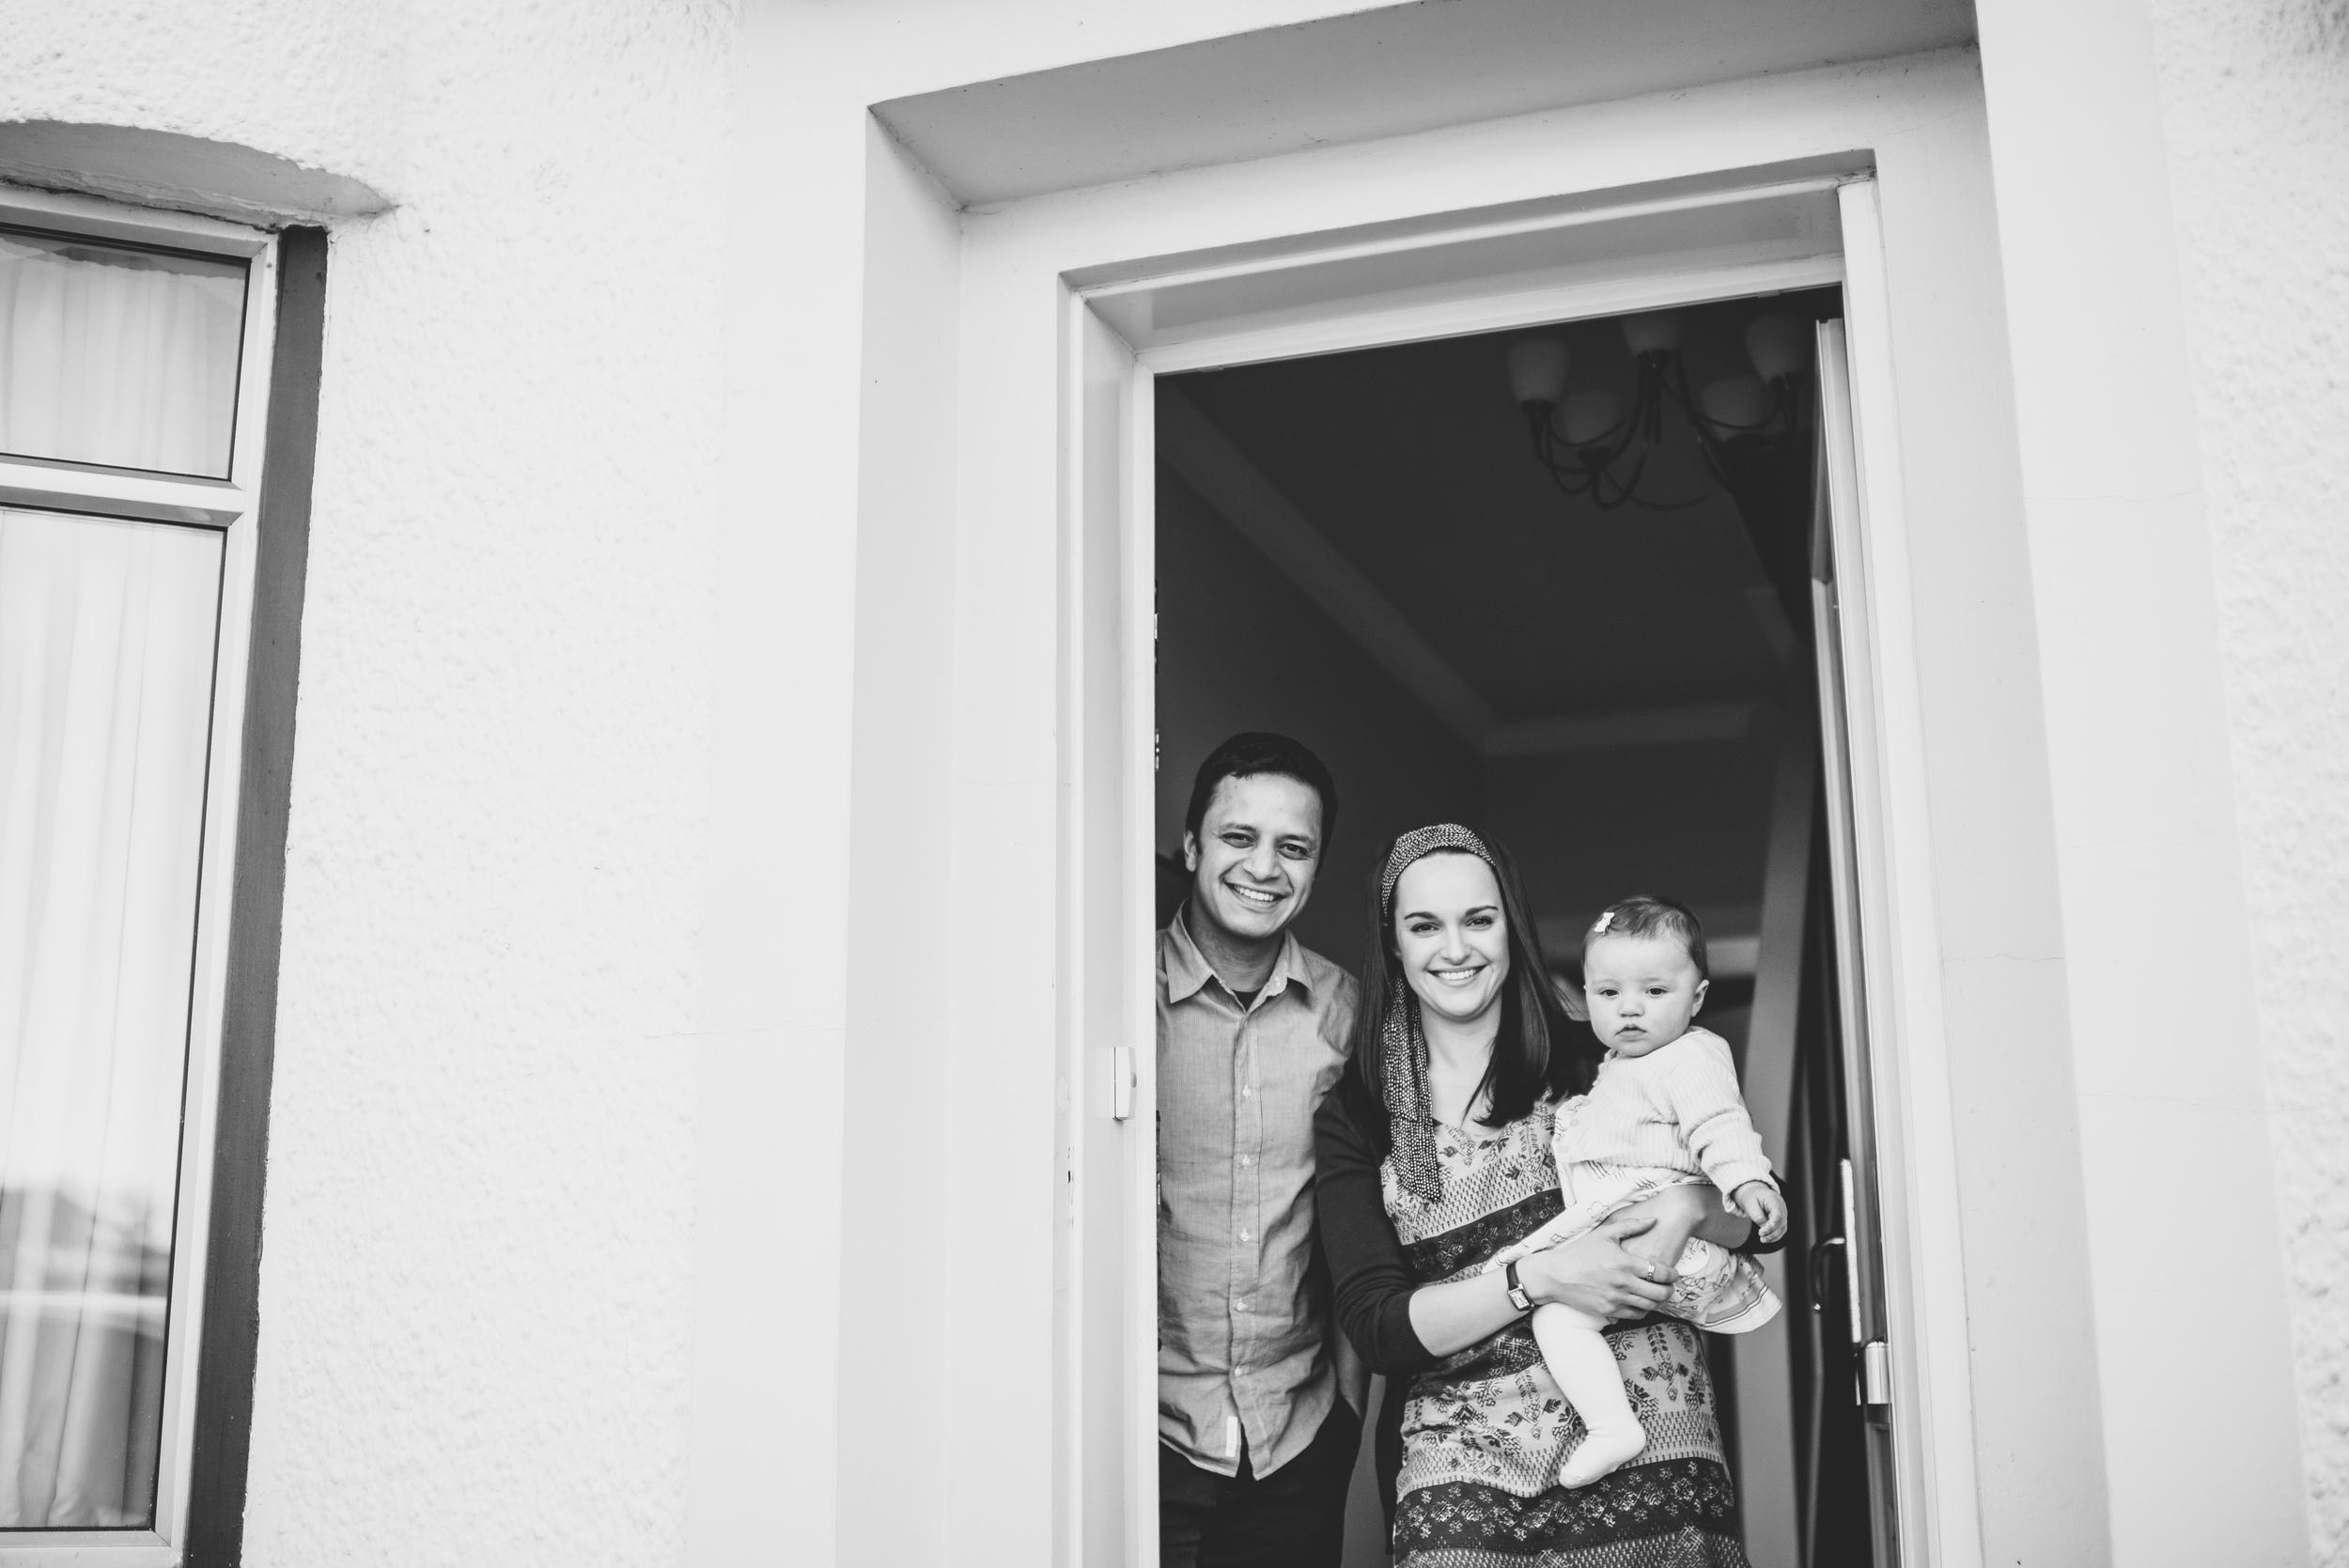 0052-ALTERNATIVE-WEDDING-PHOTOGRAPHER-GLASGOW-FAMILY-PHOTOGRAPHER-KIDS-PORTRAITS-BABY-PORTRAITS-GLASGOW.JPG